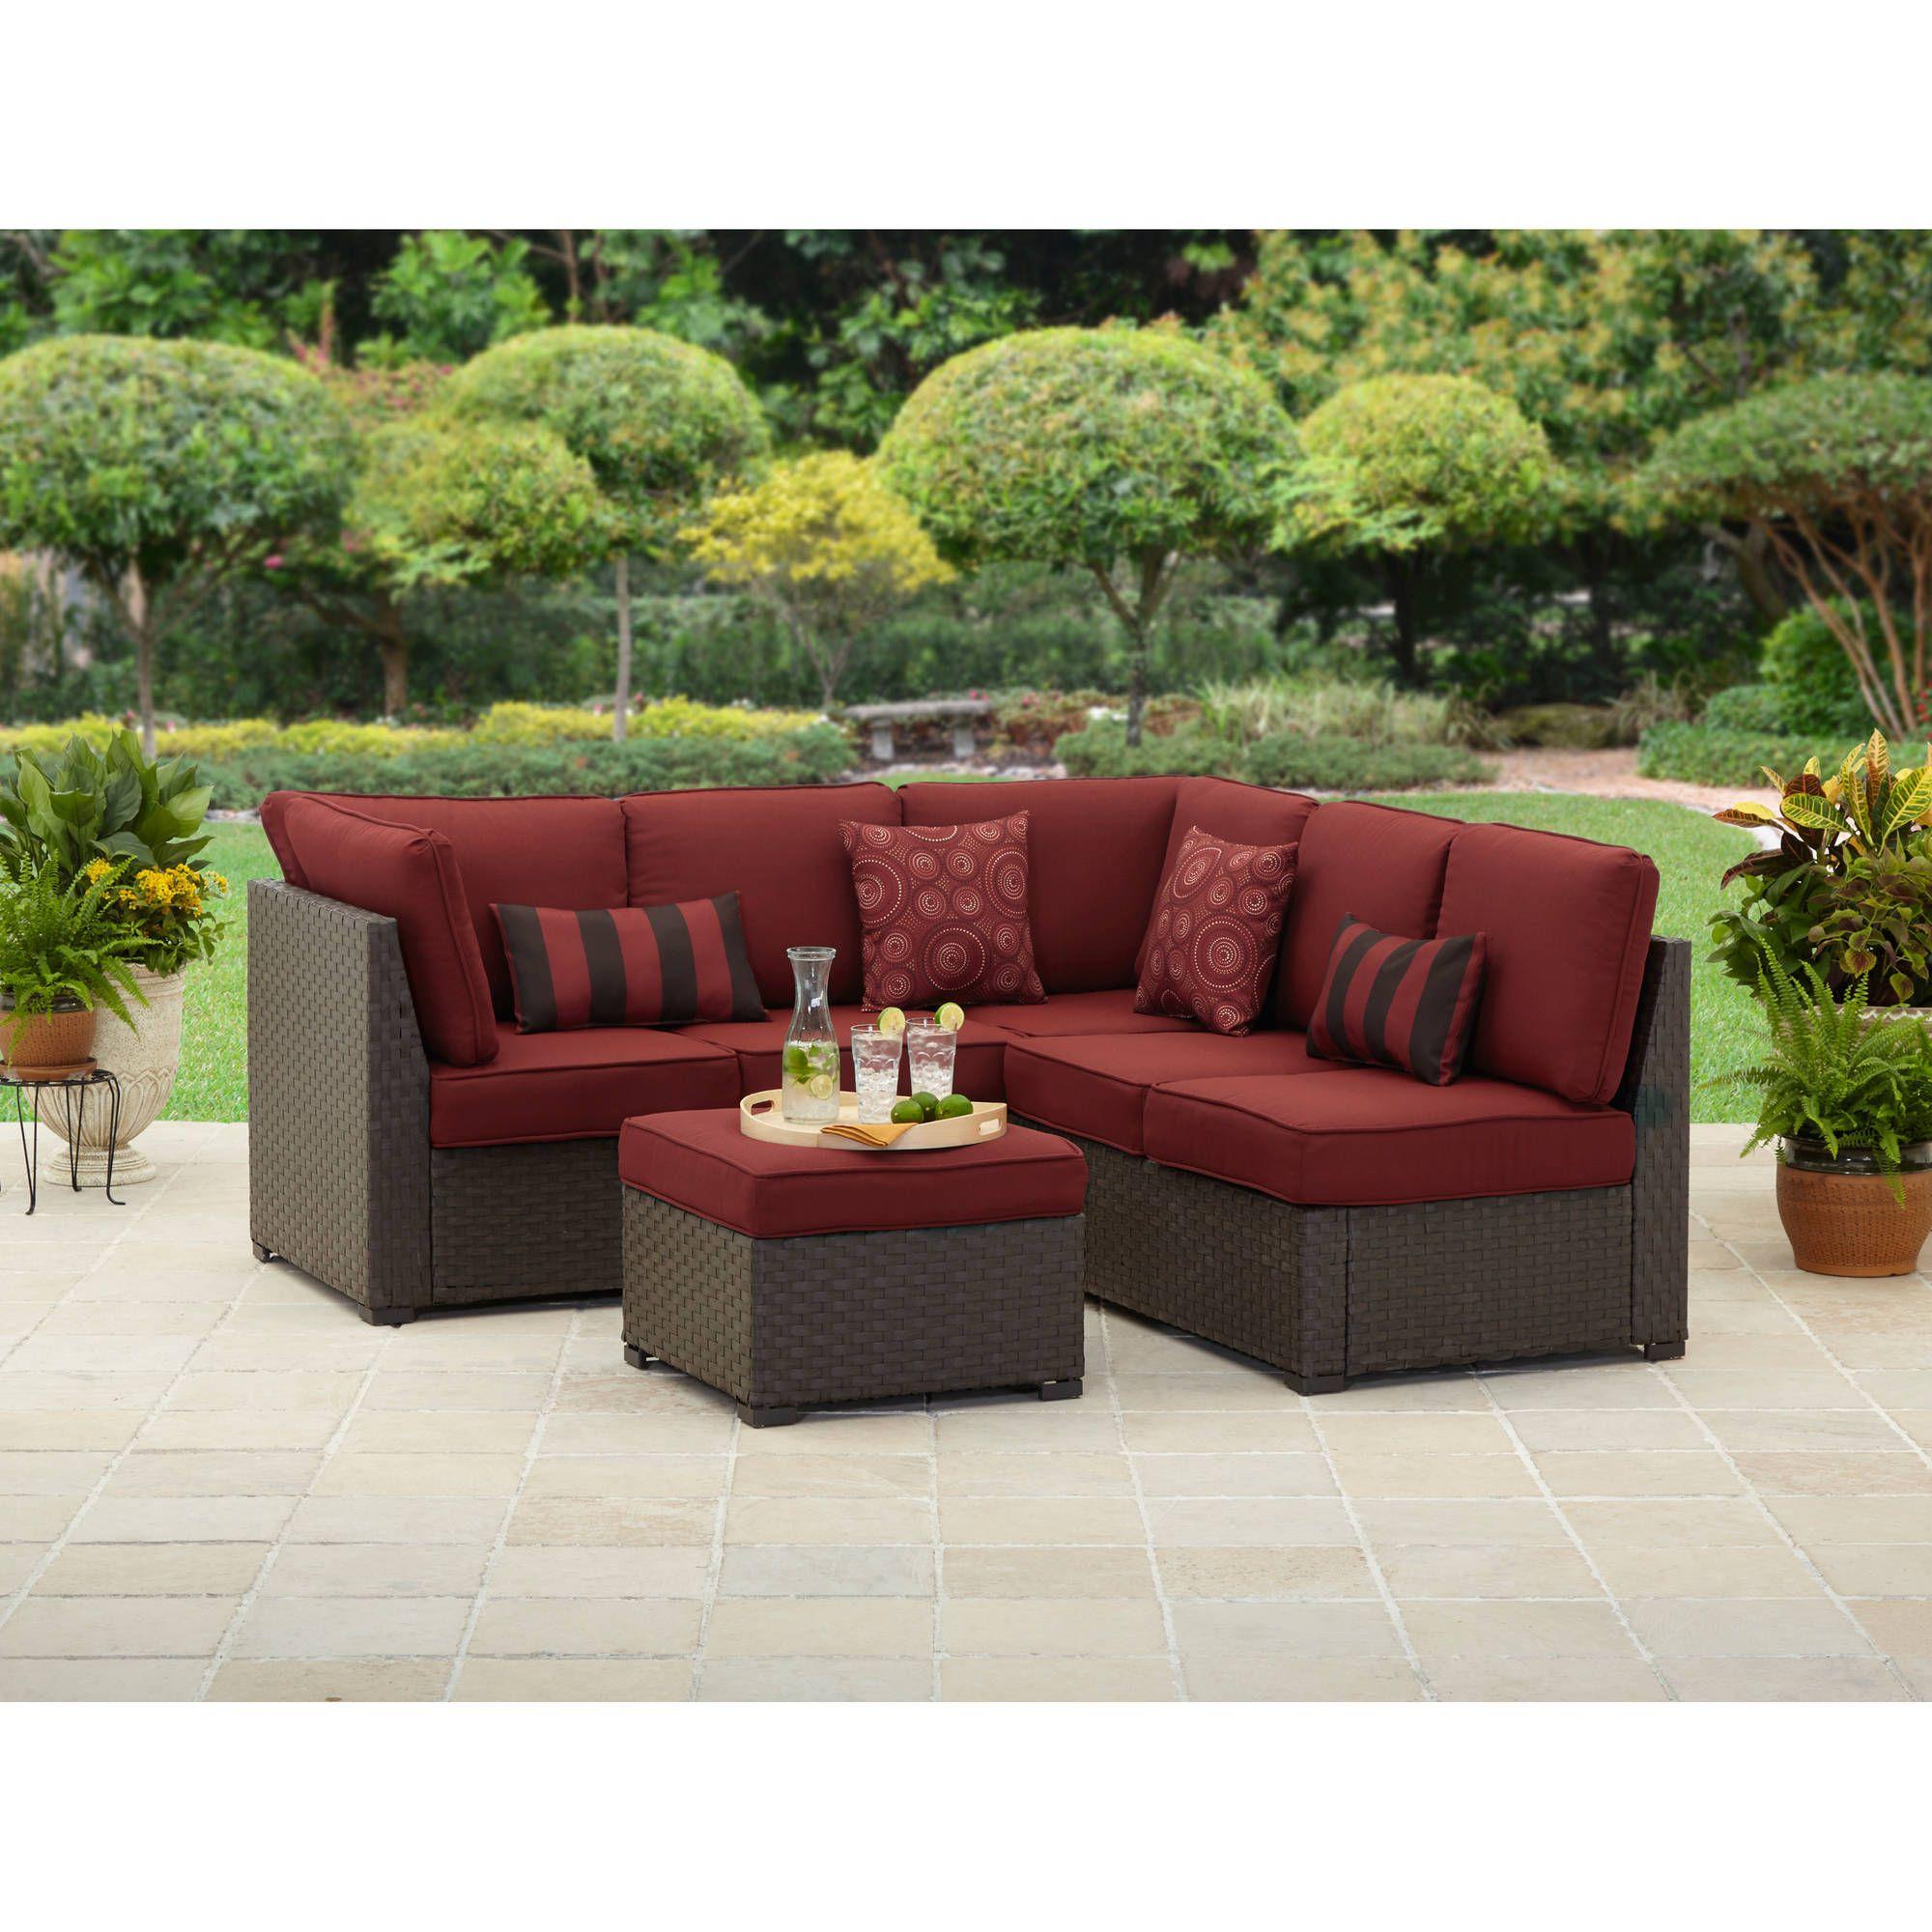 Patio & Garden   Outdoor furniture sets, Patio furniture ...